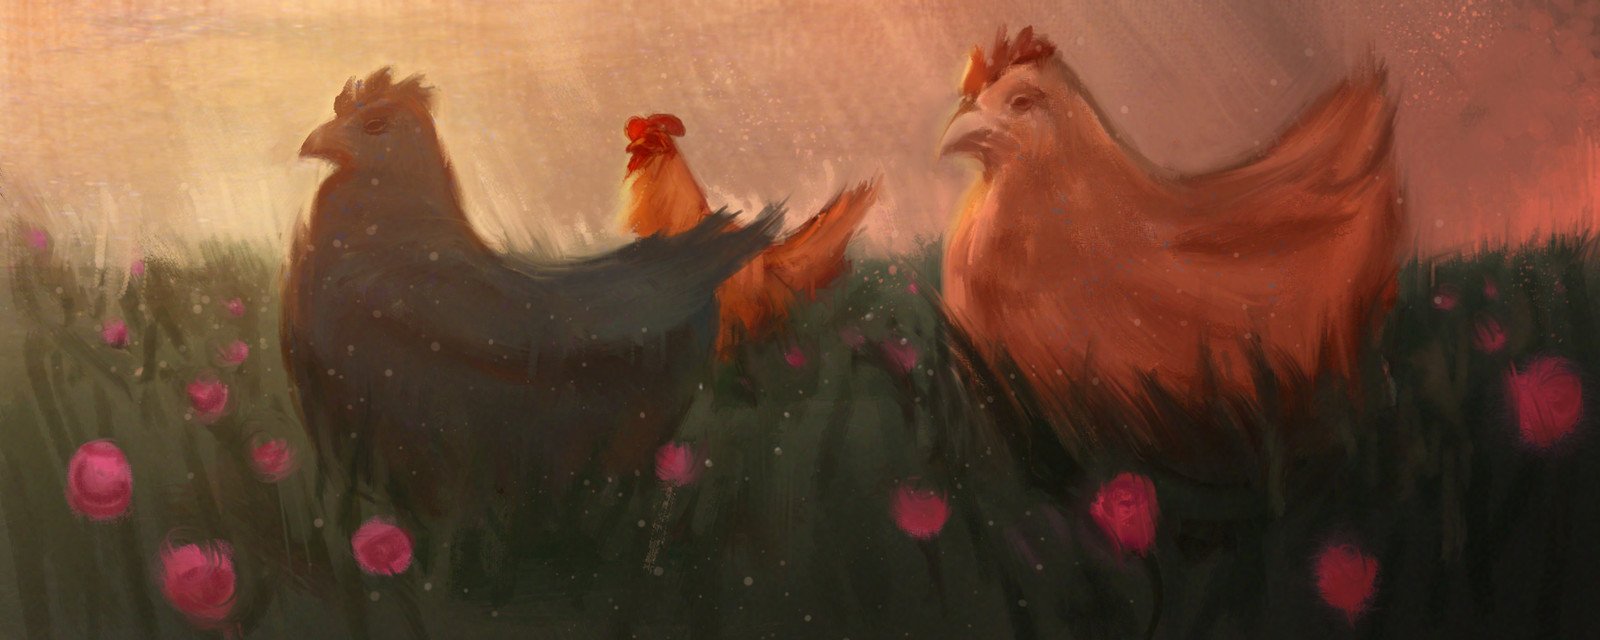 field chickens